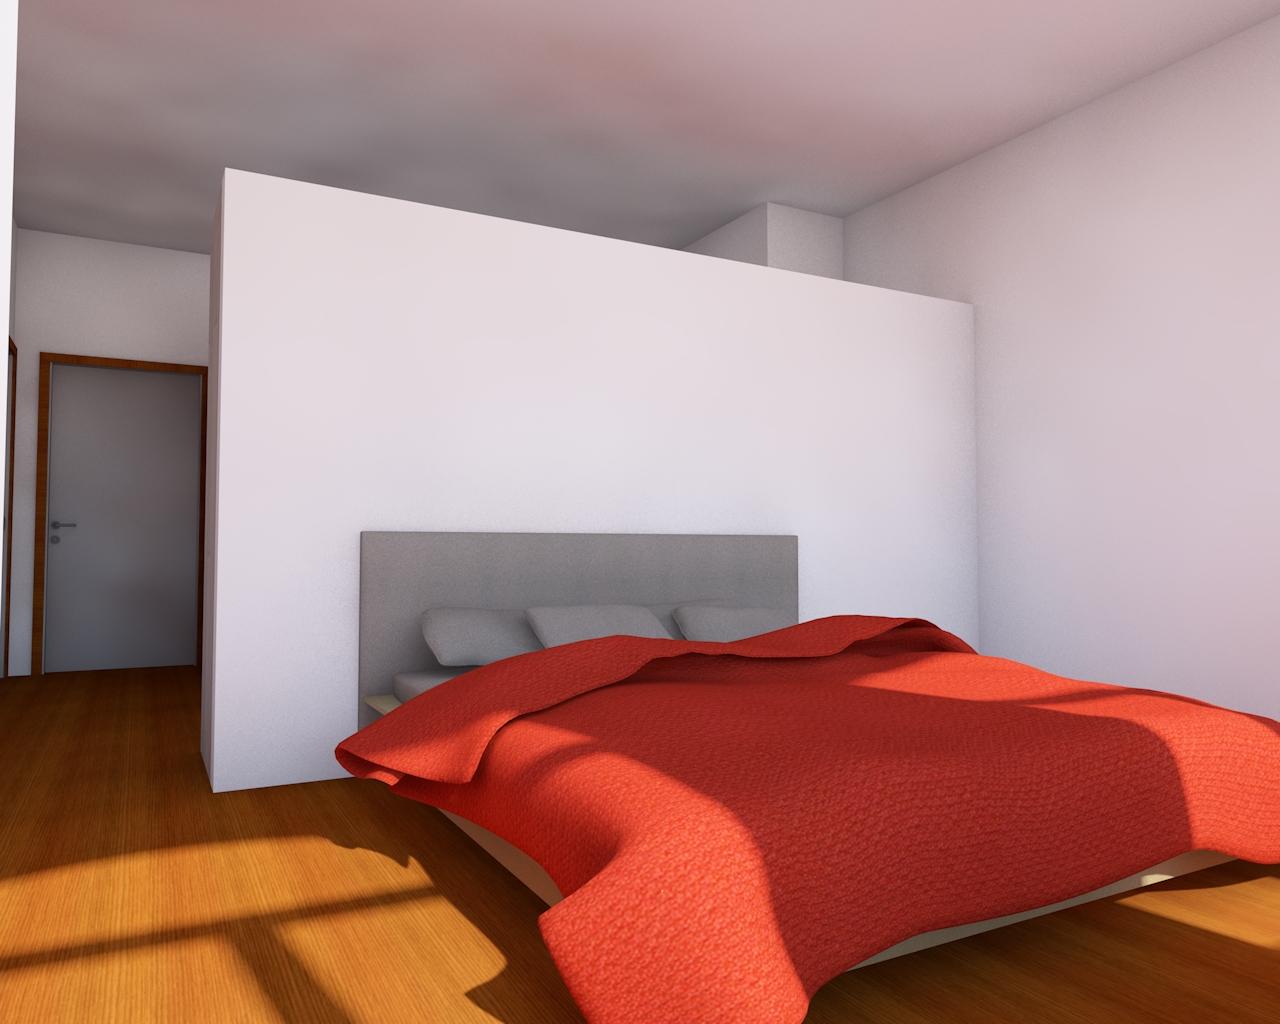 Deco slaapkamer for Deco slaapkamer